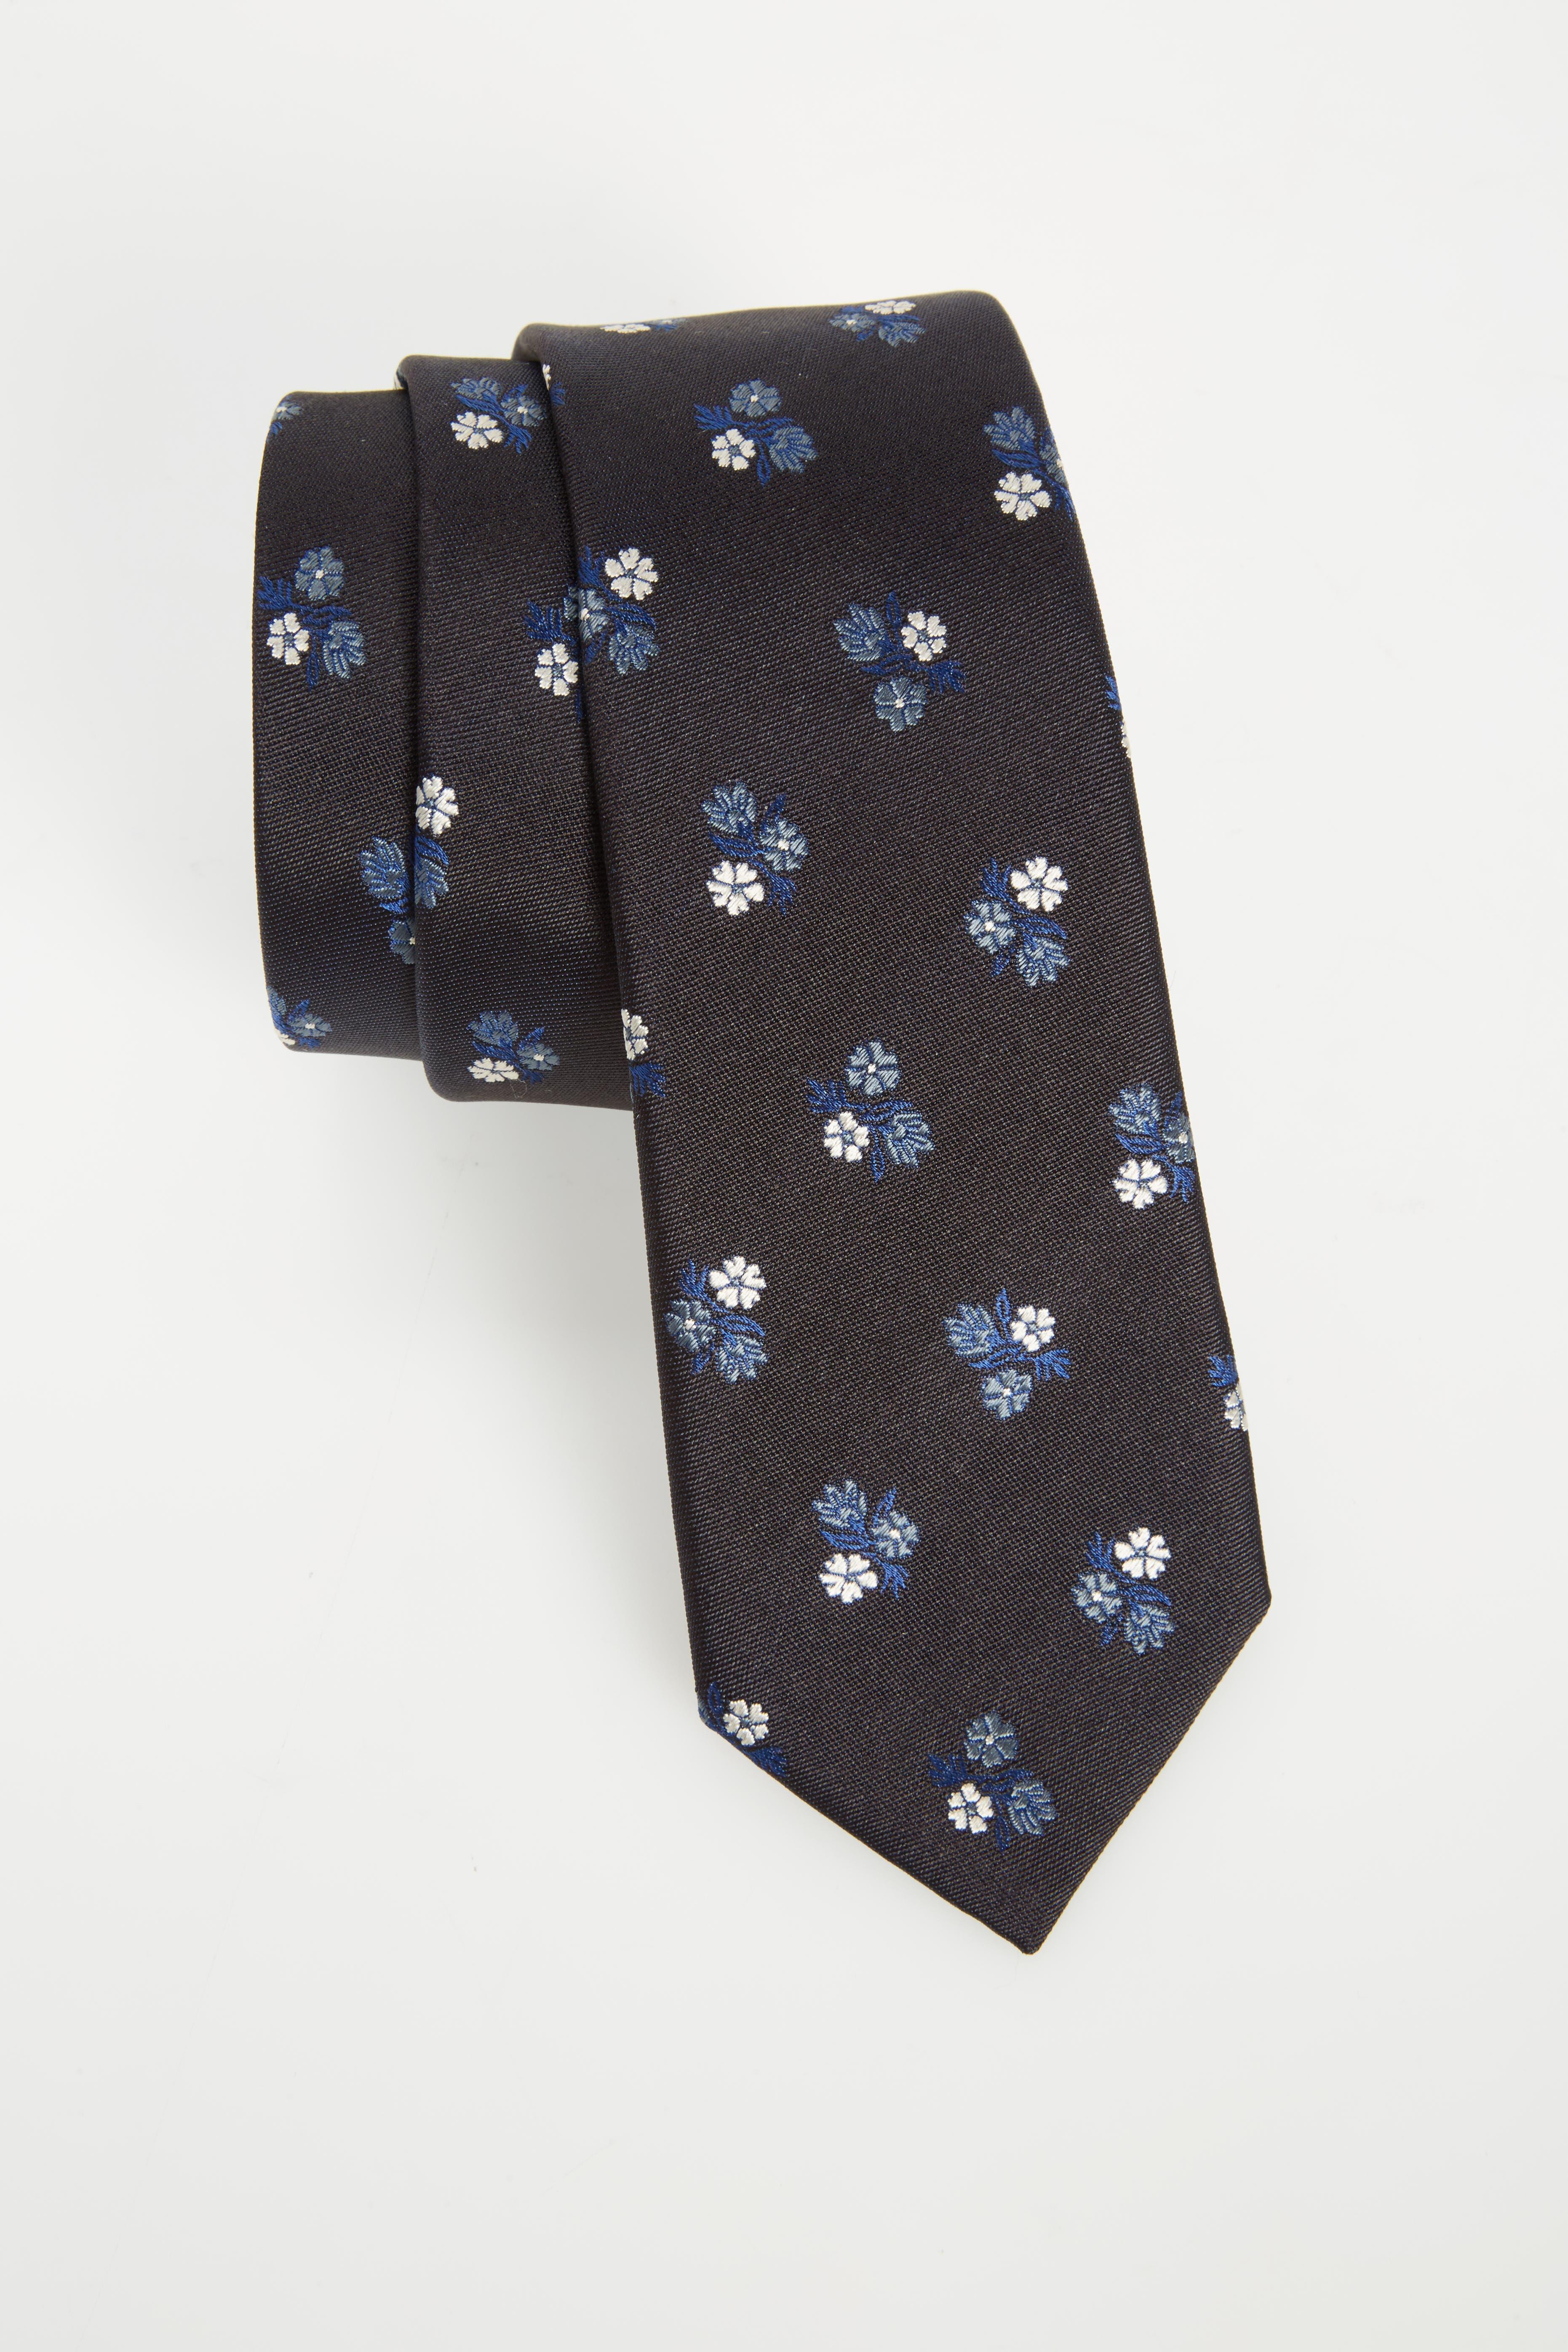 Paul Smith Floral Silk Skinny Tie